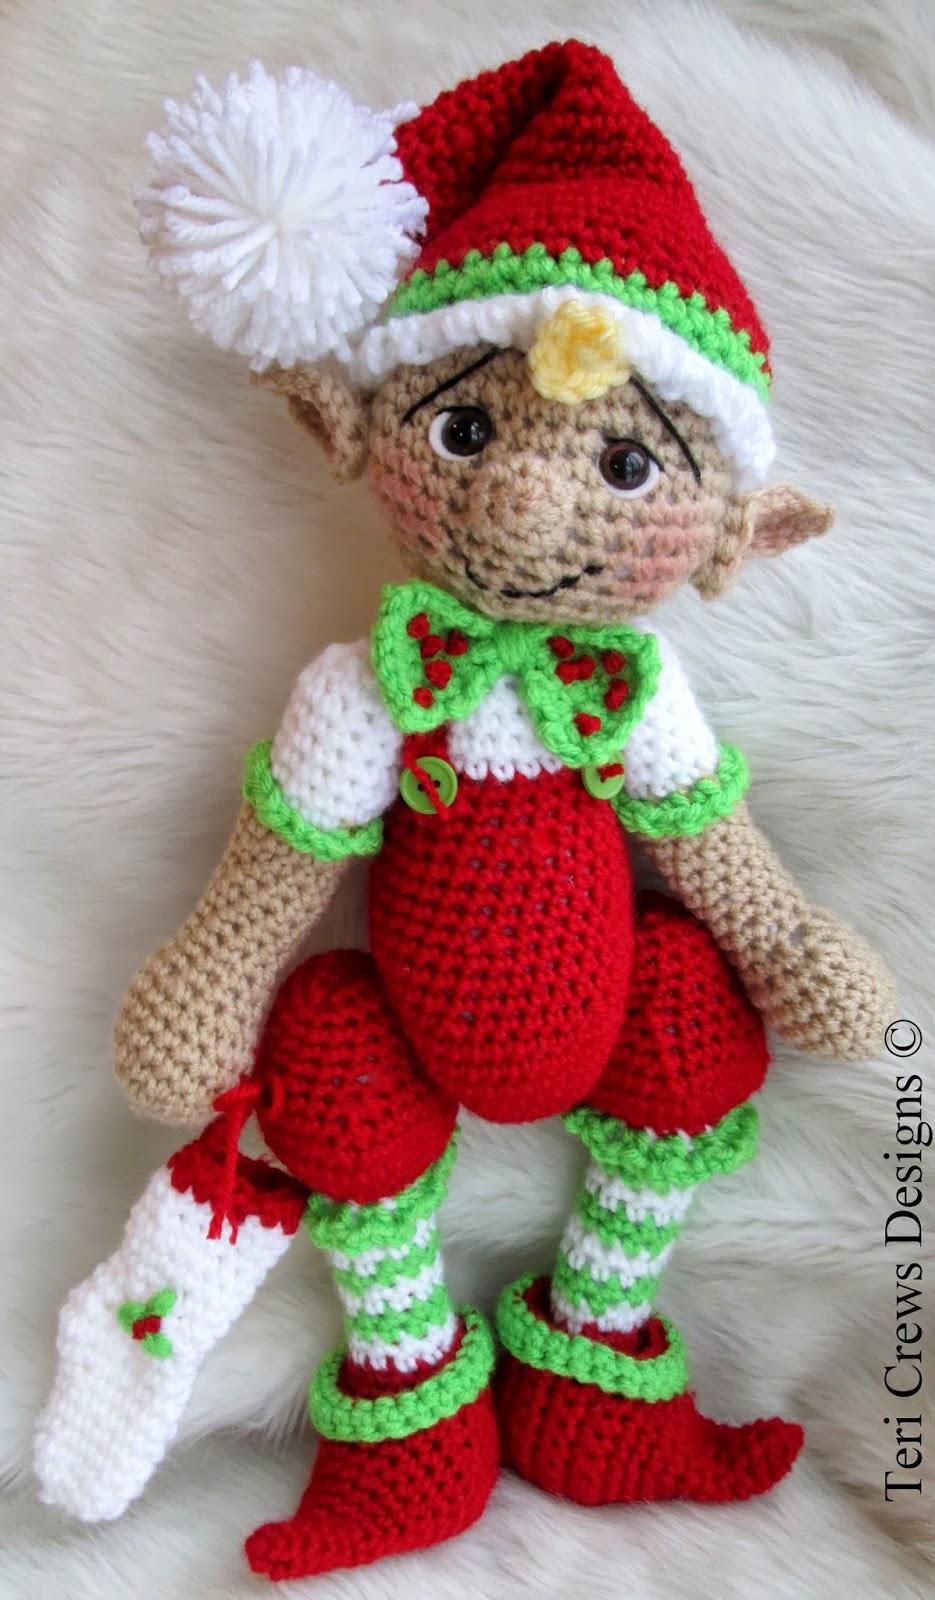 Teri\'s Blog: New Simply Cute Elf Crochet Pattern